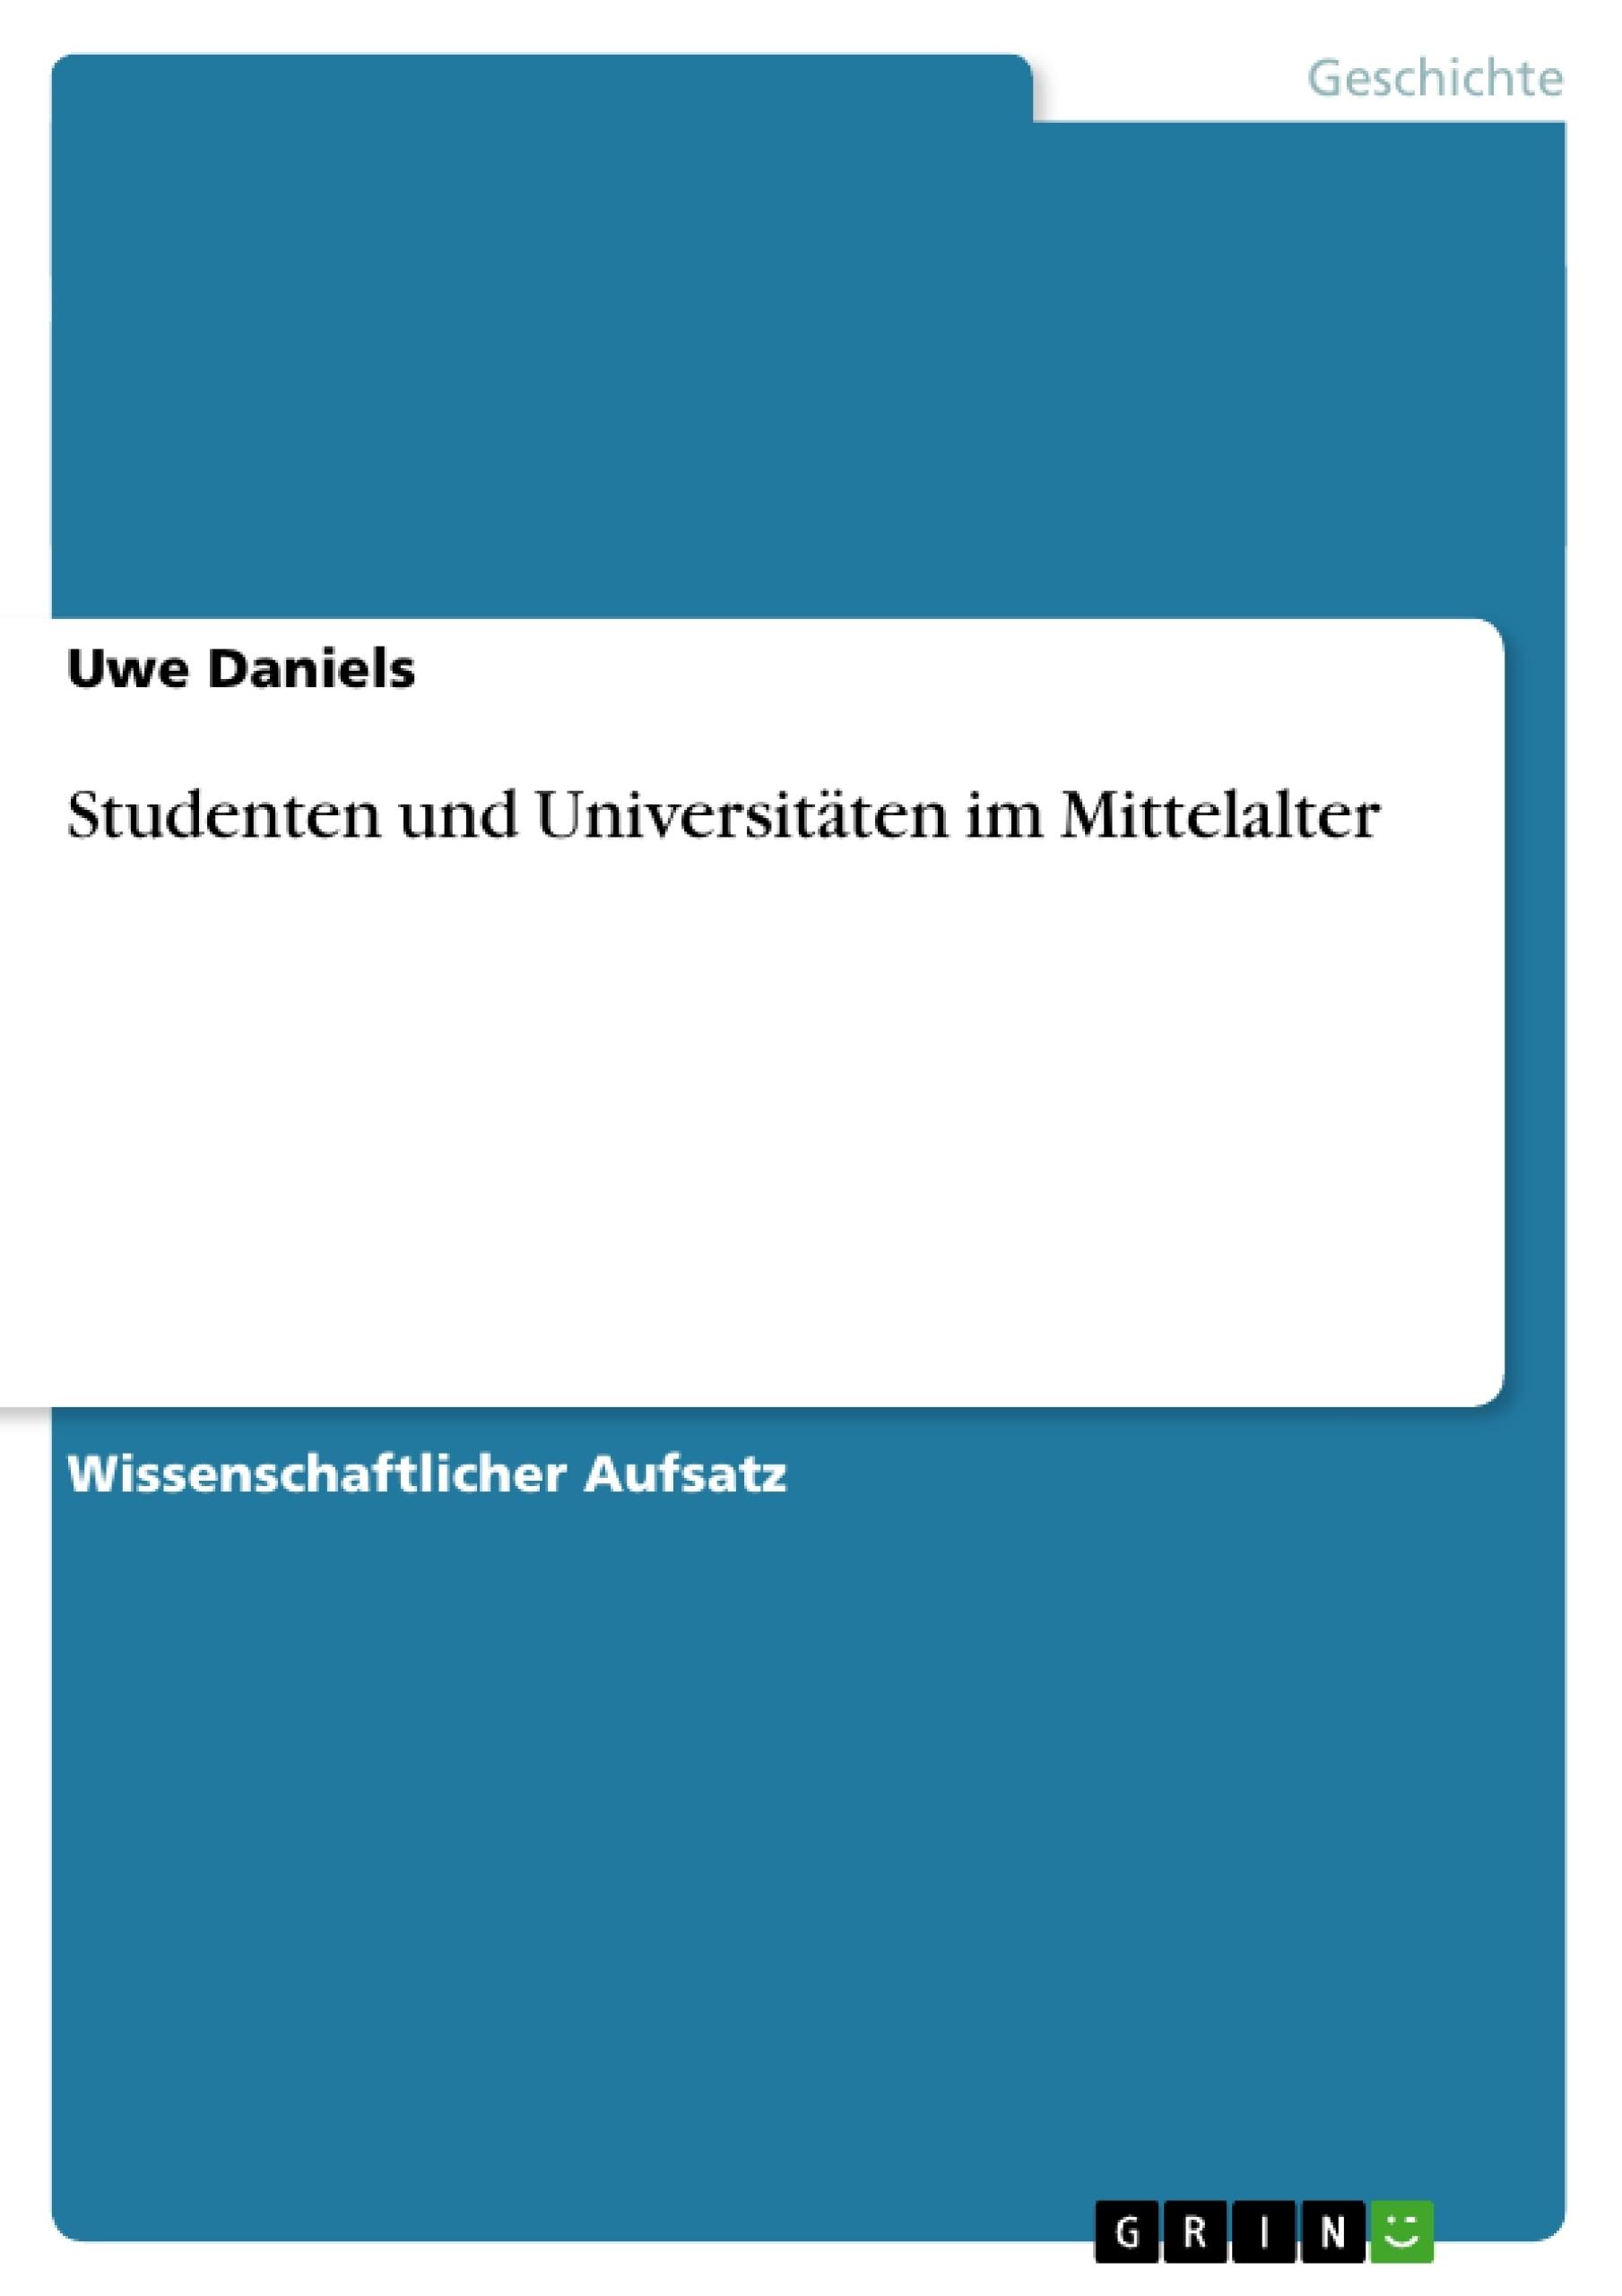 Titel: Studenten und Universitäten im Mittelalter